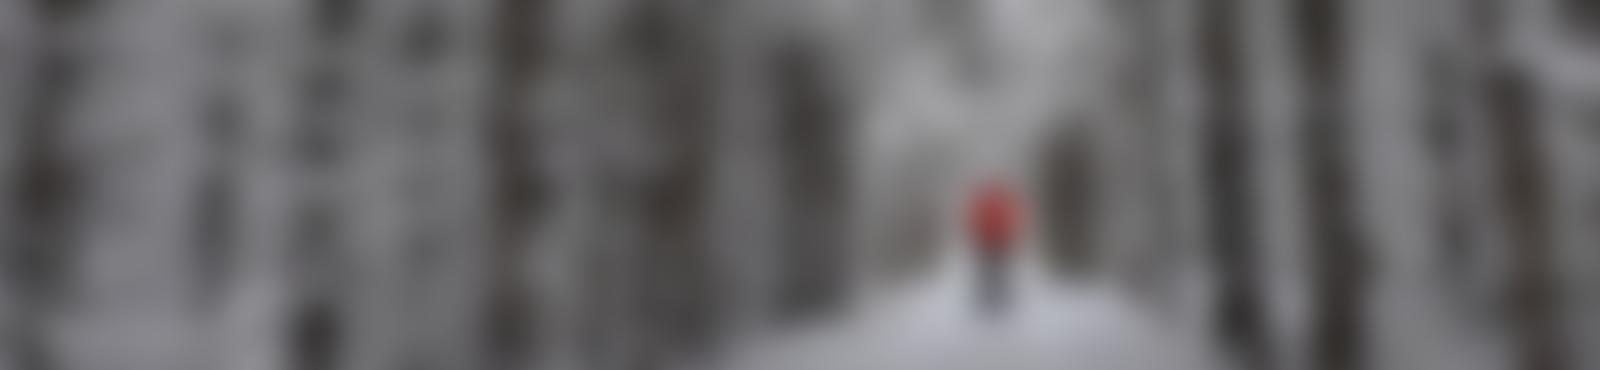 Blurred 9ebad589 4d9c 4ae2 9214 19f83b96c224